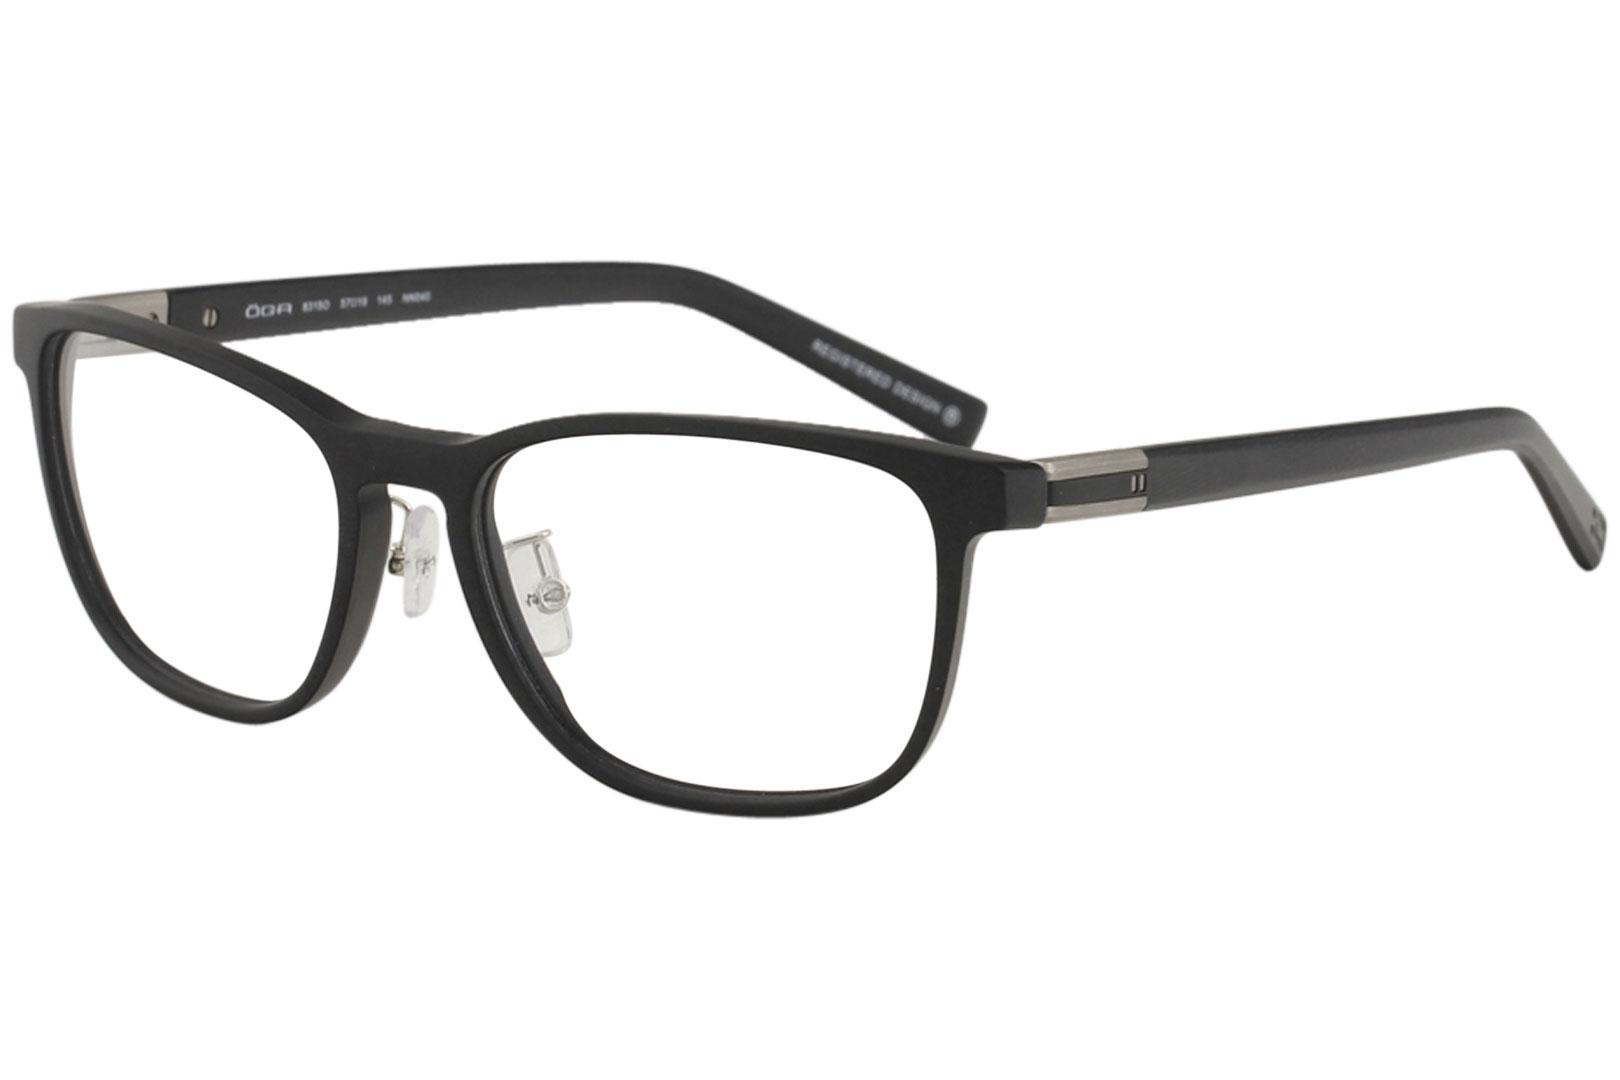 49ebe185995 EFINNY Women Men Classic Eyeglass Frames Eyewear Optical Plain Clear lens  Glasses